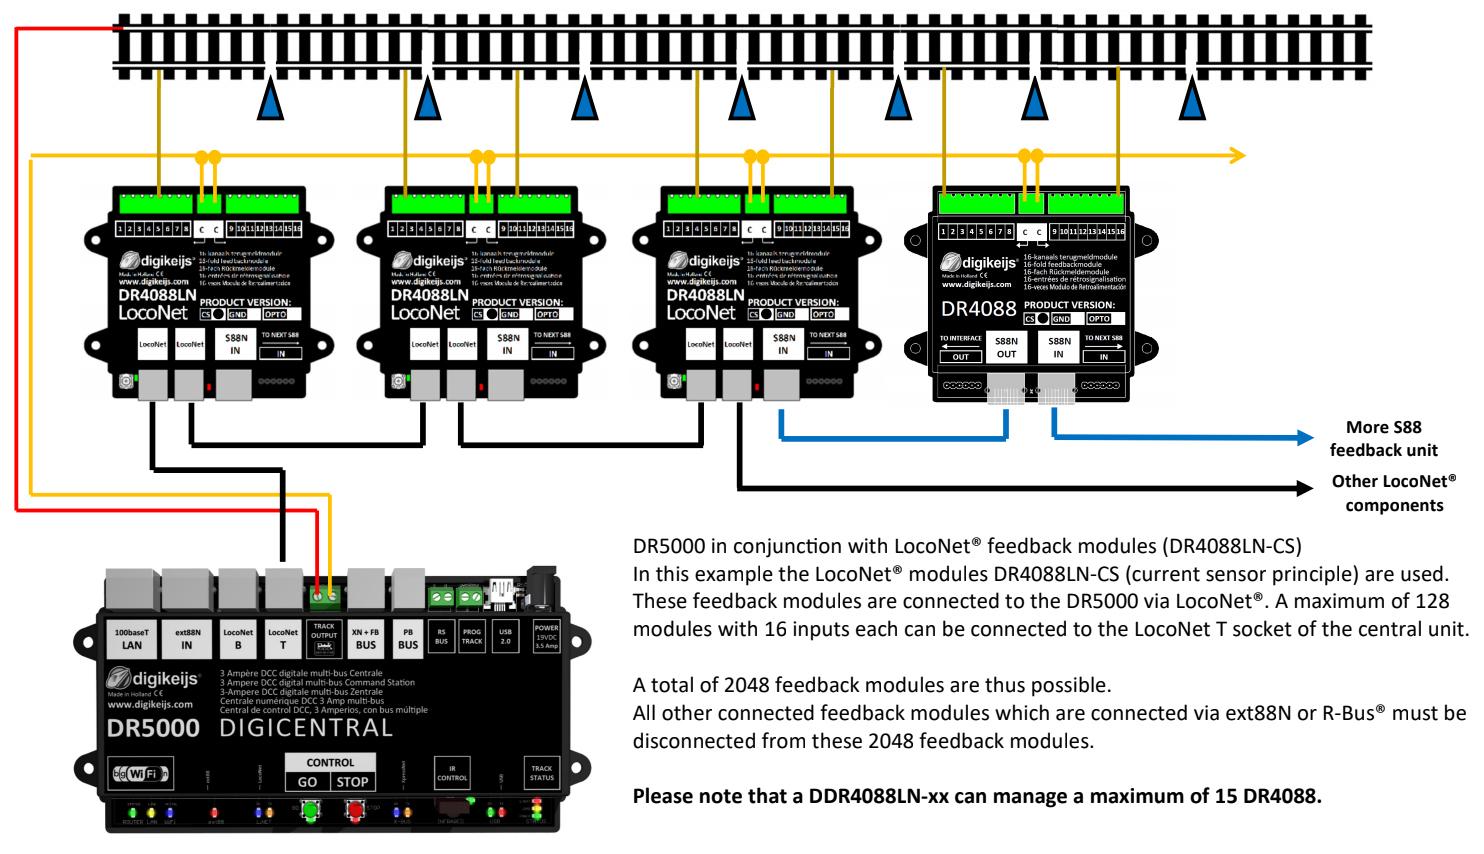 Digikeijs dr4088ln-cs 16 canali rückmelde modulo s88n con loconet-Ovp Nuovo DC